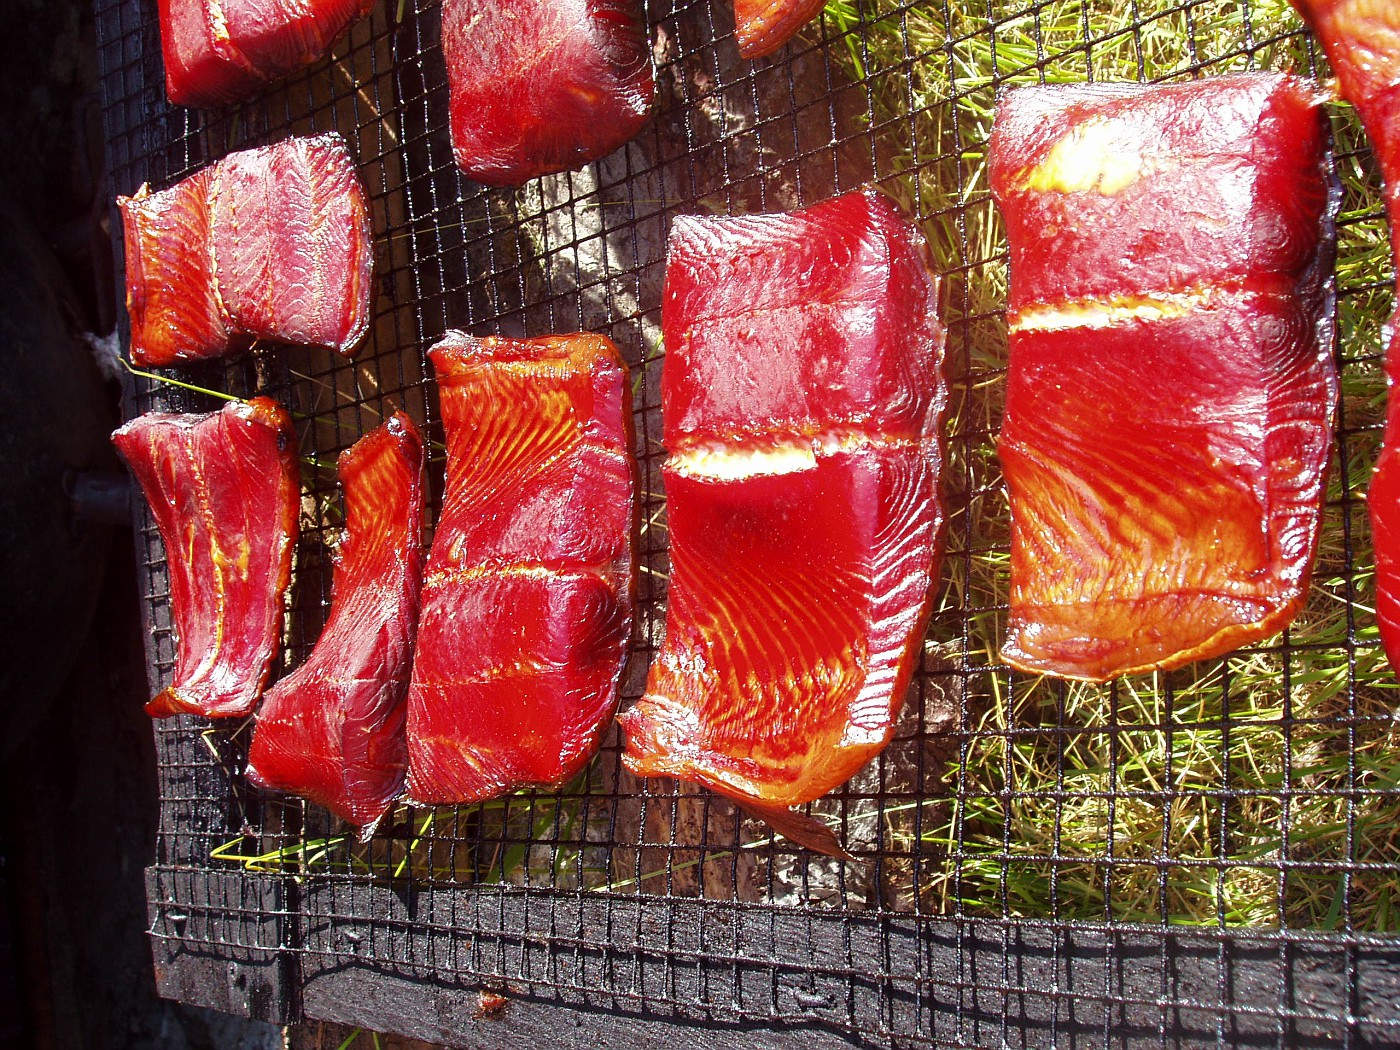 Smoked King Salmon